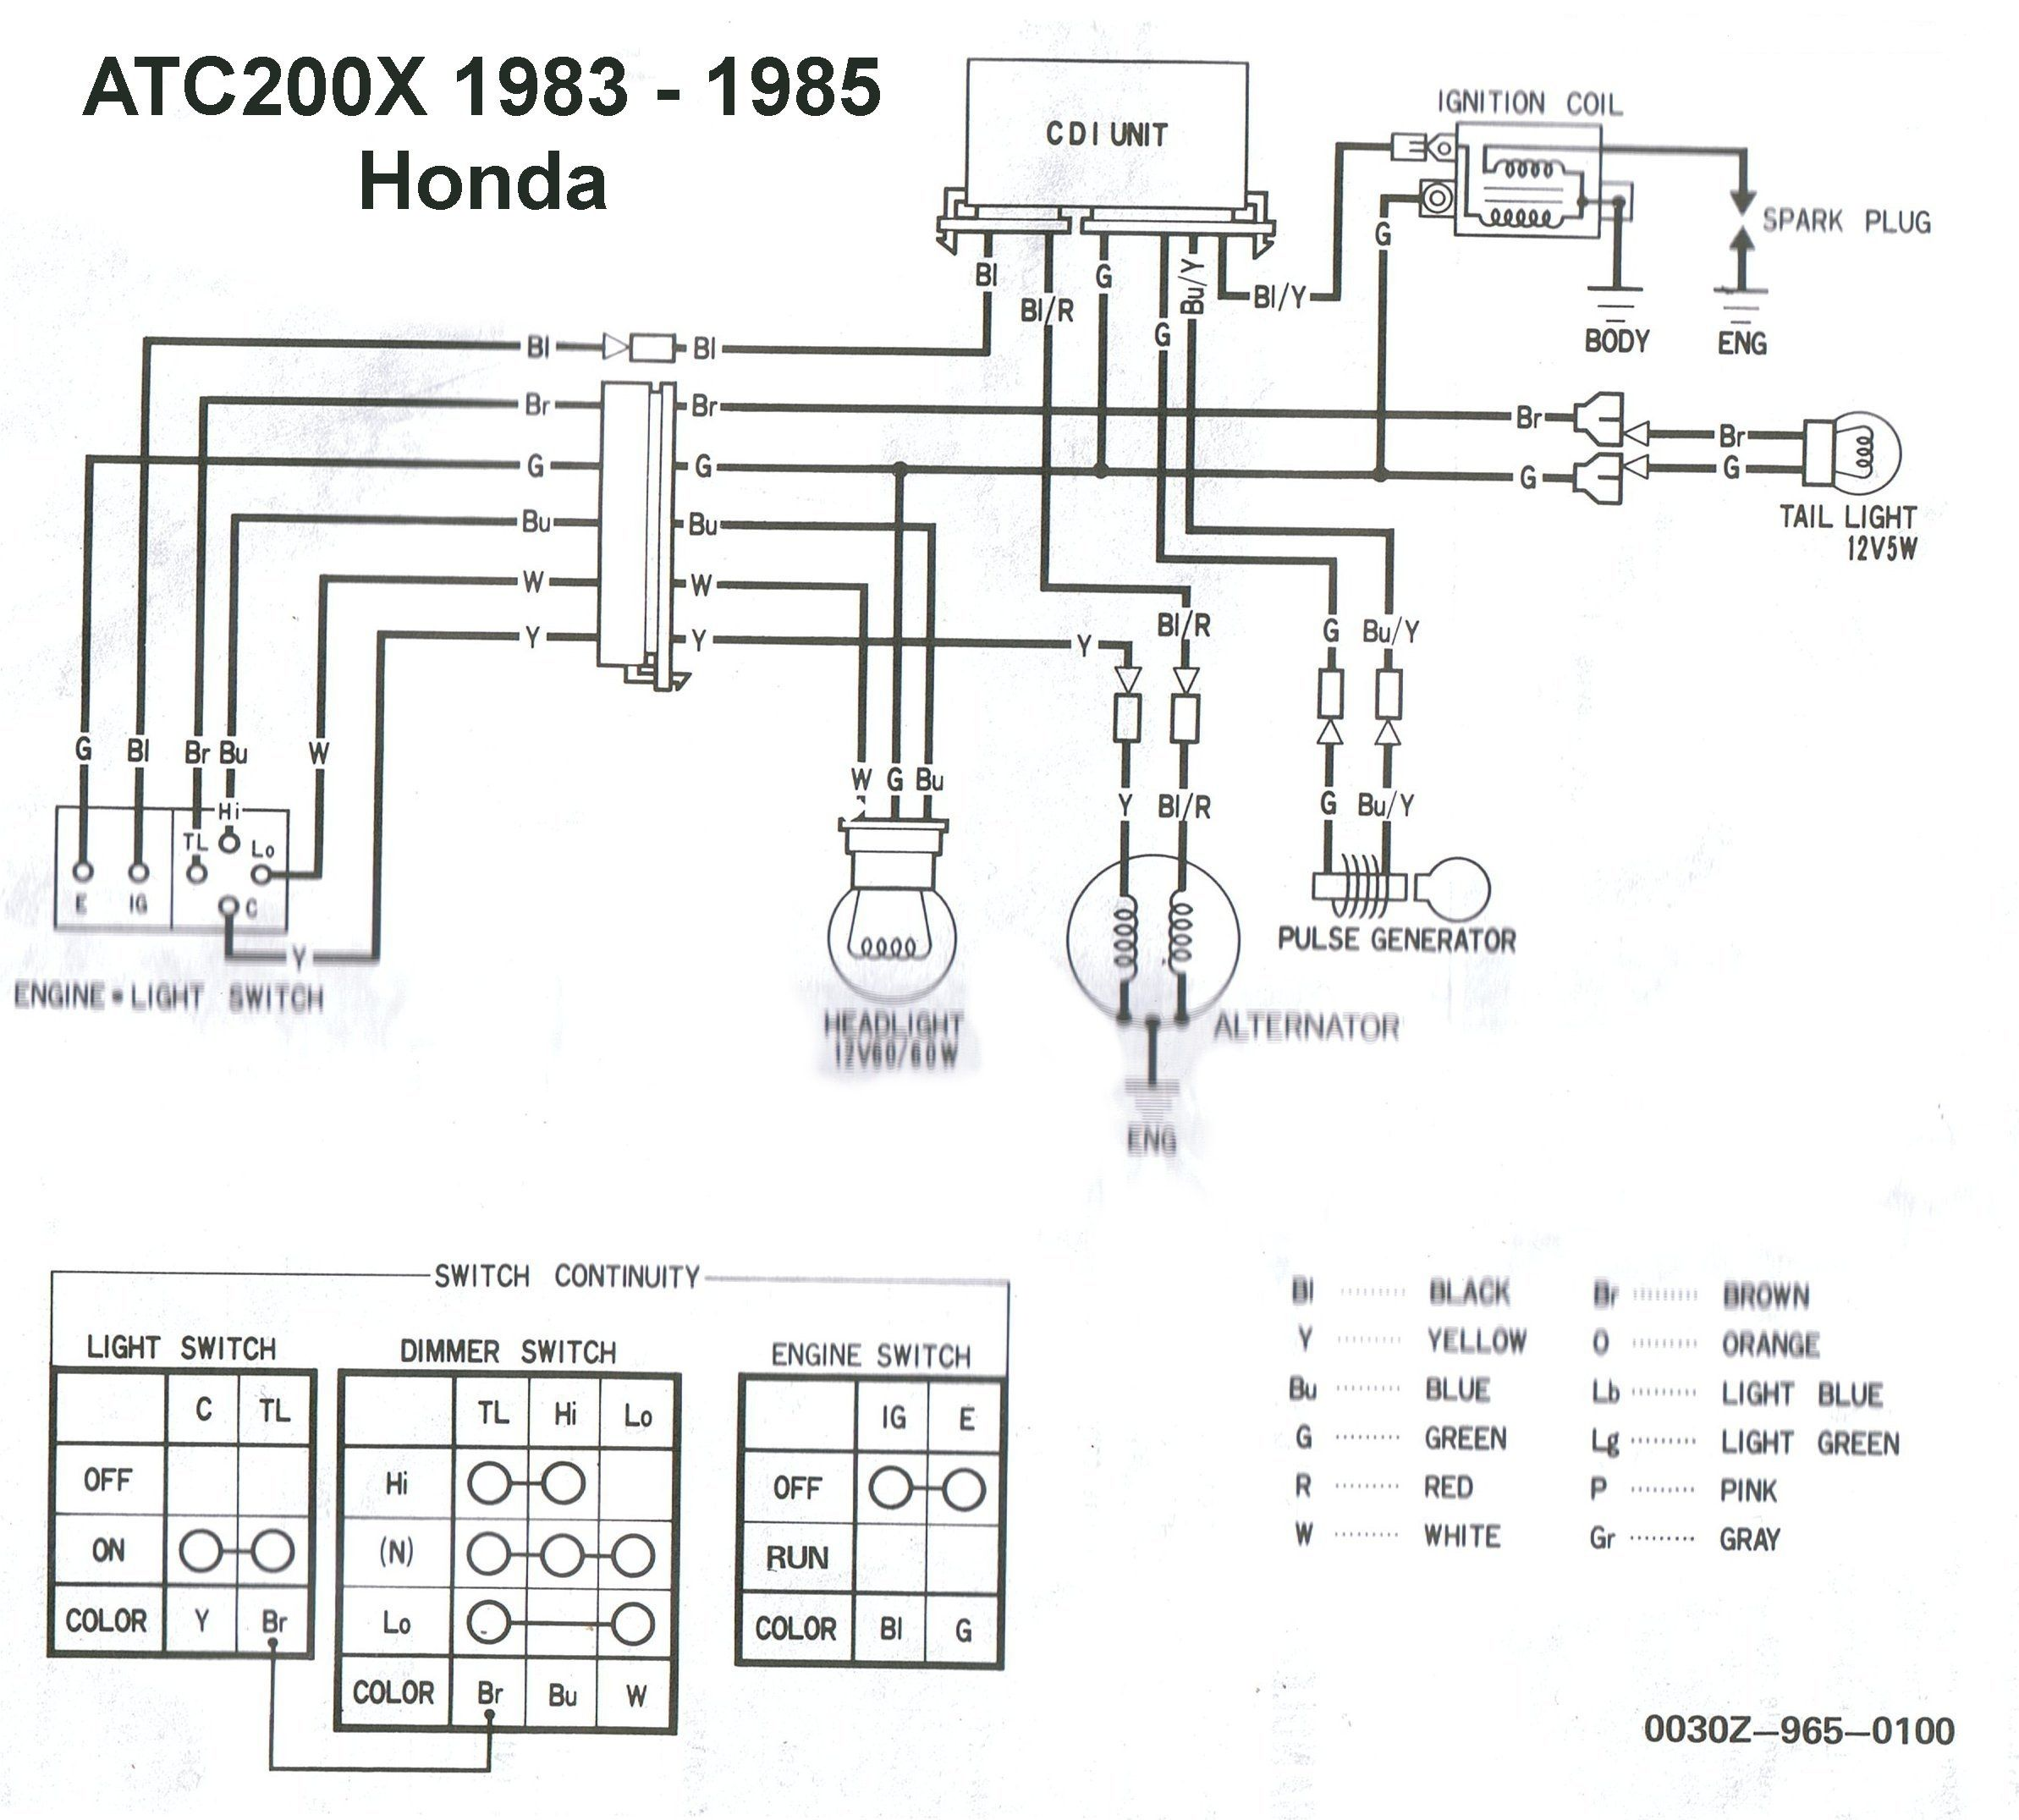 Wiring Diagram Honda Atc200x 1983 Thru 1985 Factory Diagram